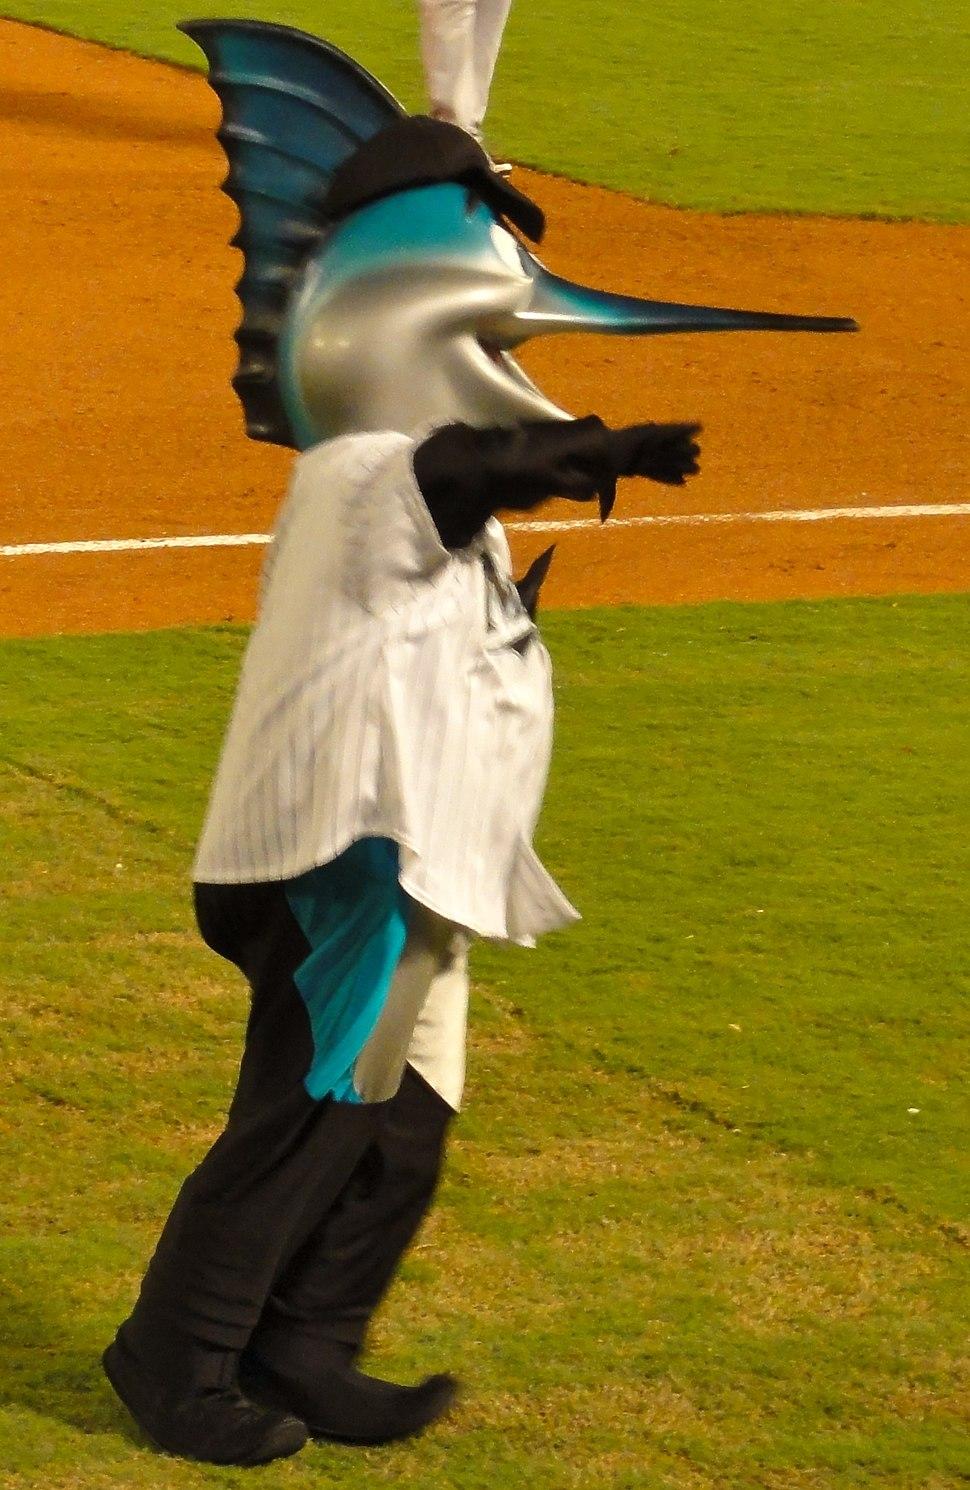 Billy the Marlin 2011